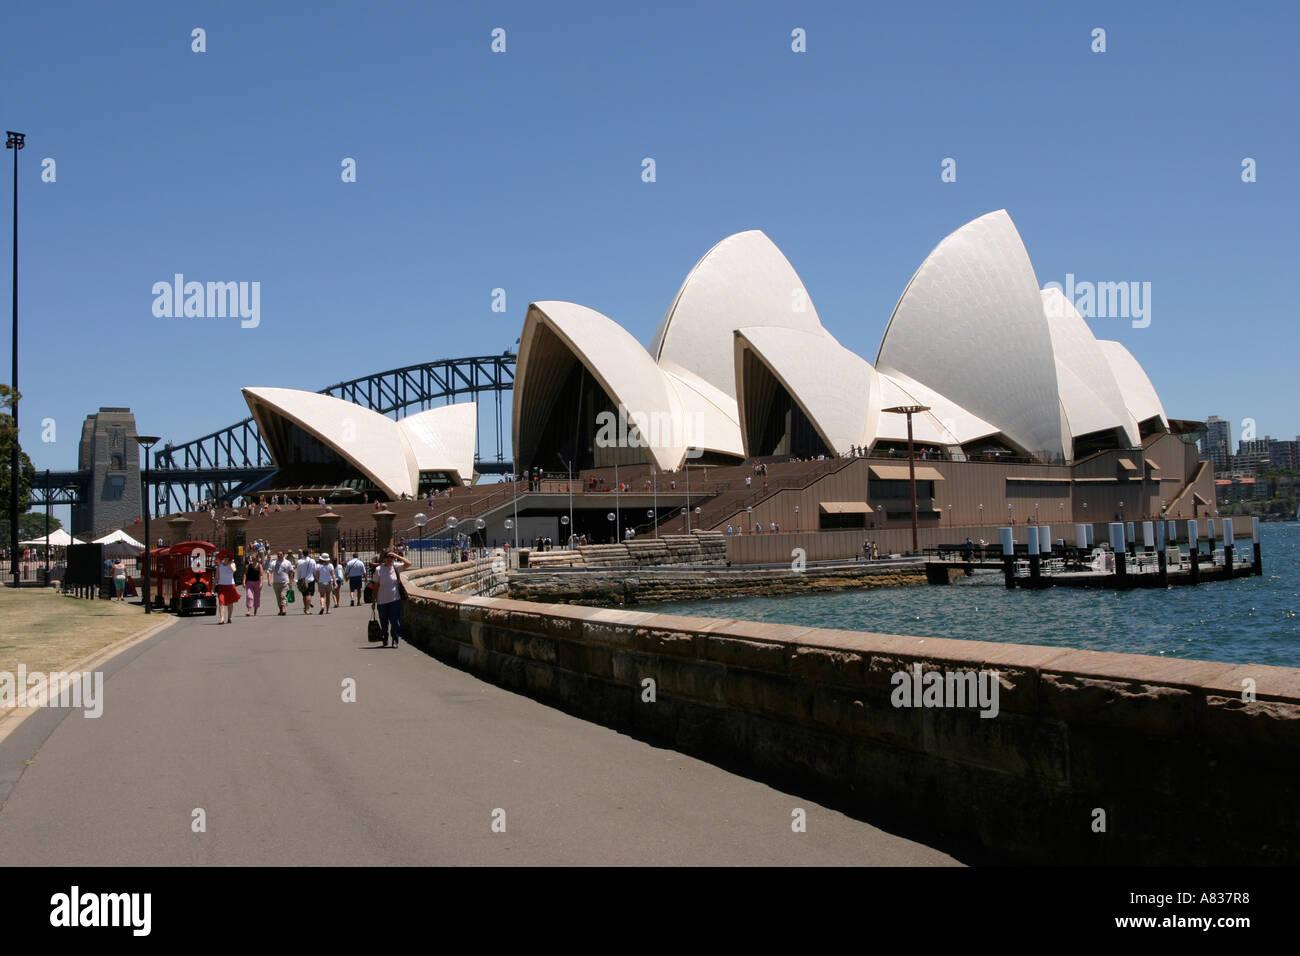 Sydney opera house and harbour bridge - Stock Photo Sydney Opera House On A Beautiful Summers Day With The Sydney Harbour Bridge In The Background